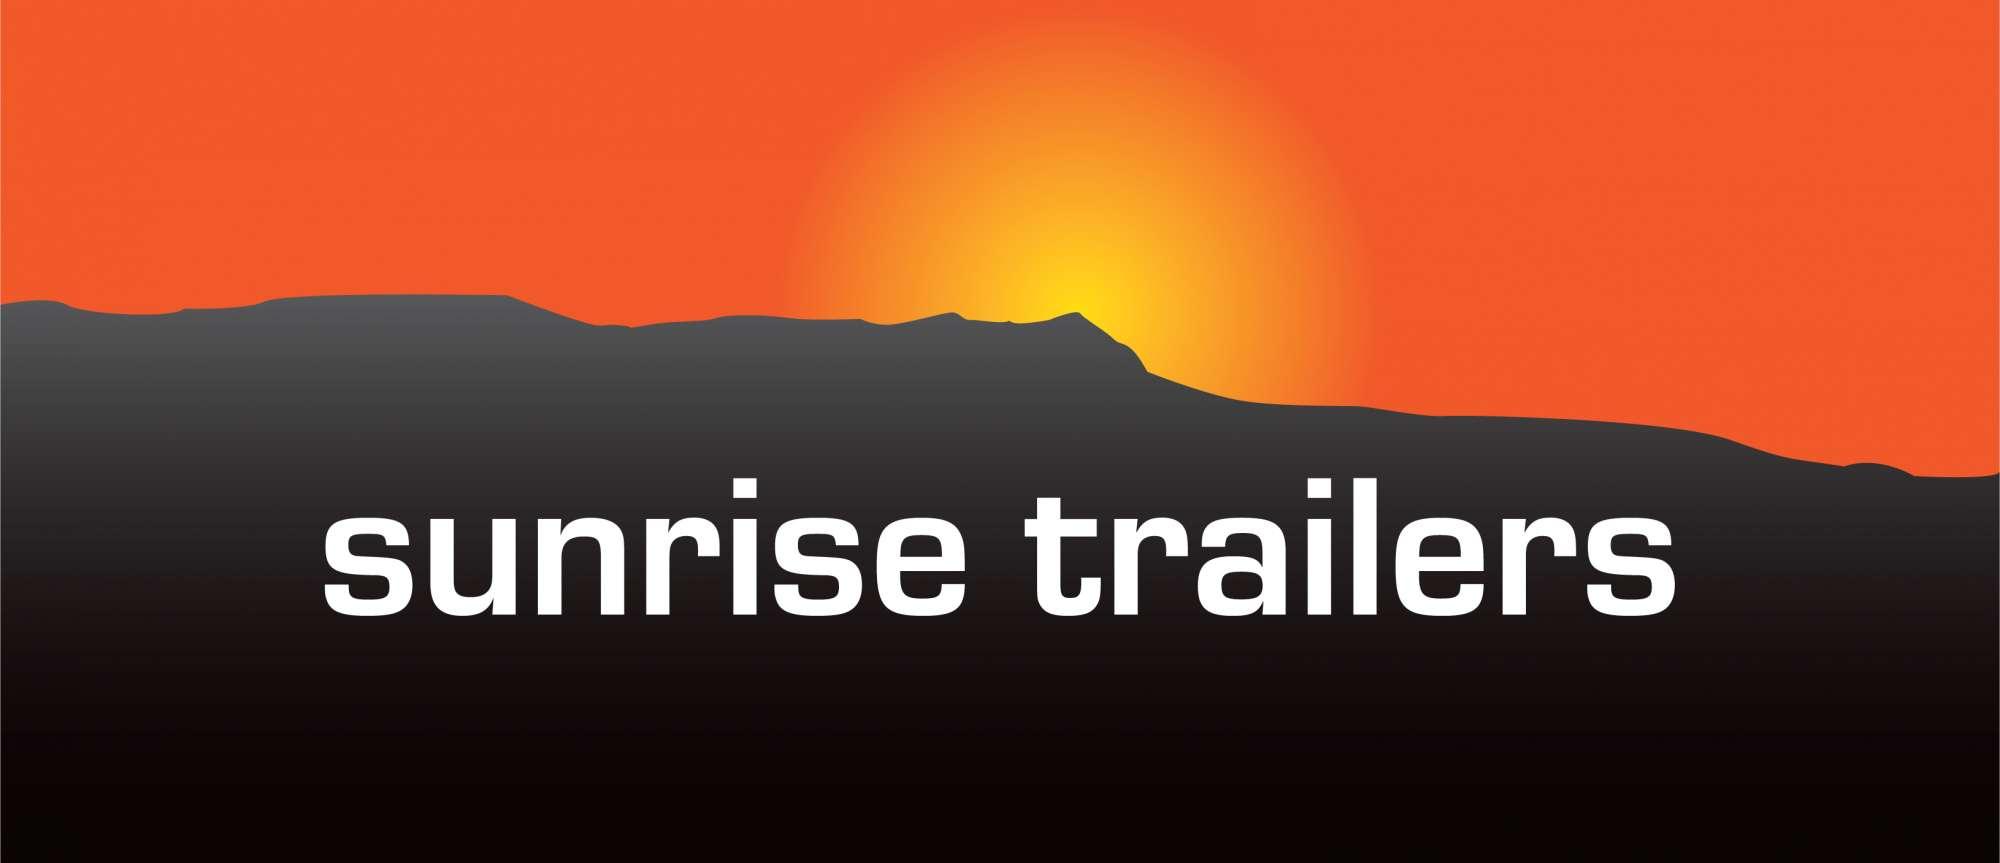 Sunrise trailers CMYK H 300dpi